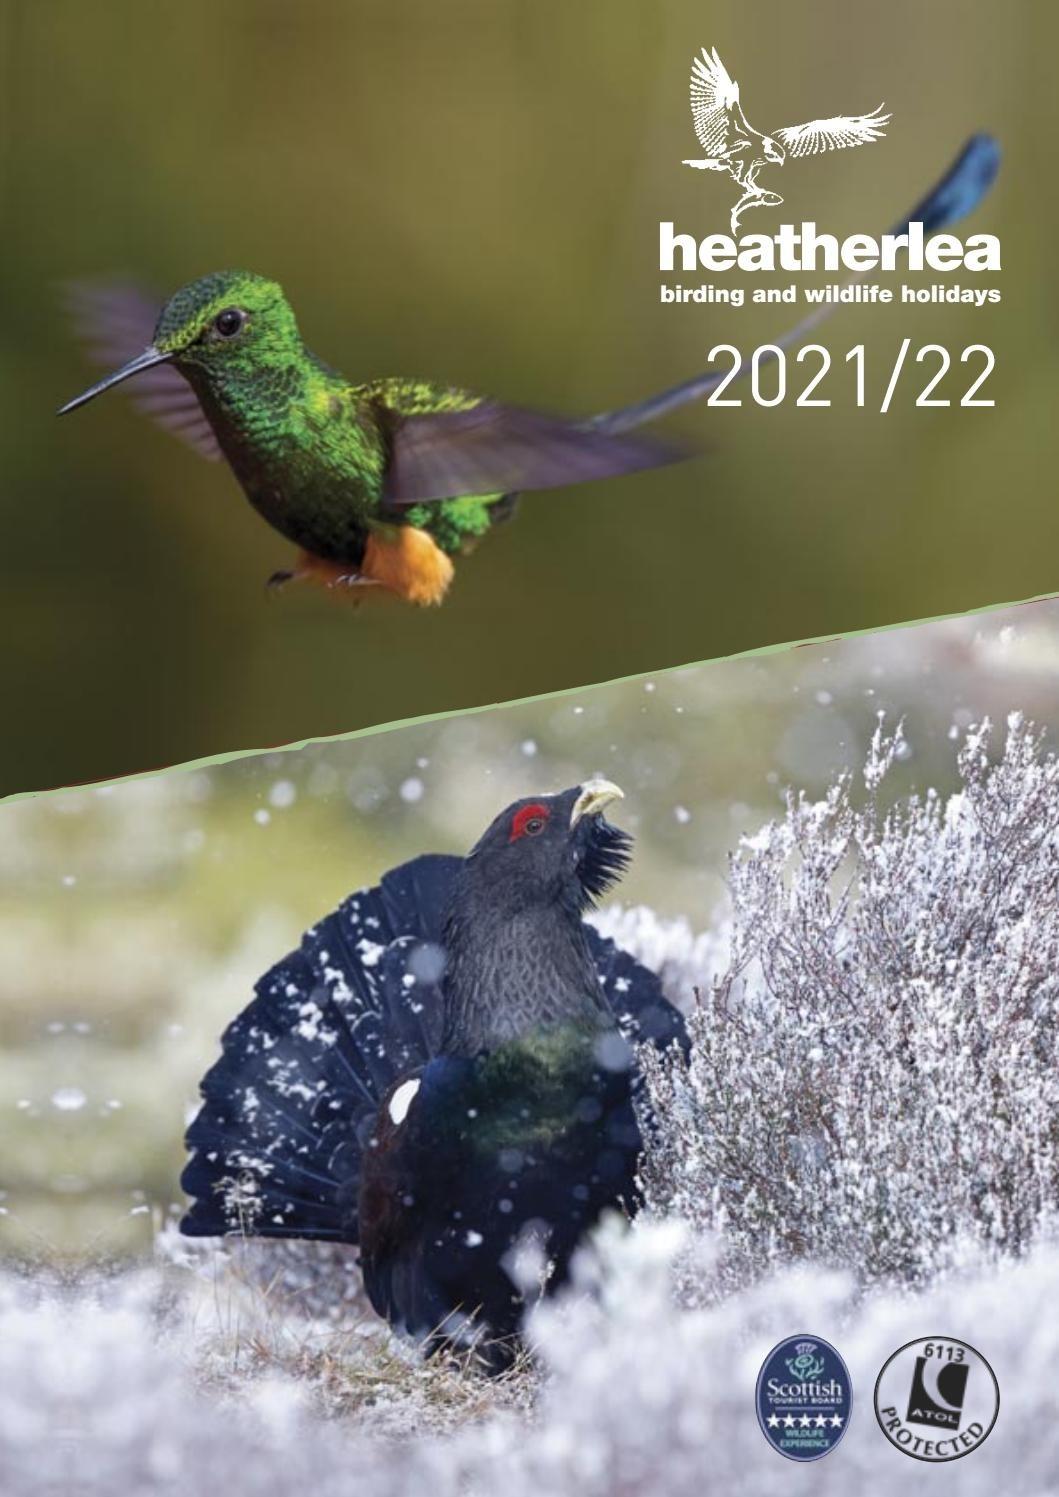 Heatherlea Brochure 2021/22Heatherlea Birdwatching - Issuu  2021 Southern Rutt